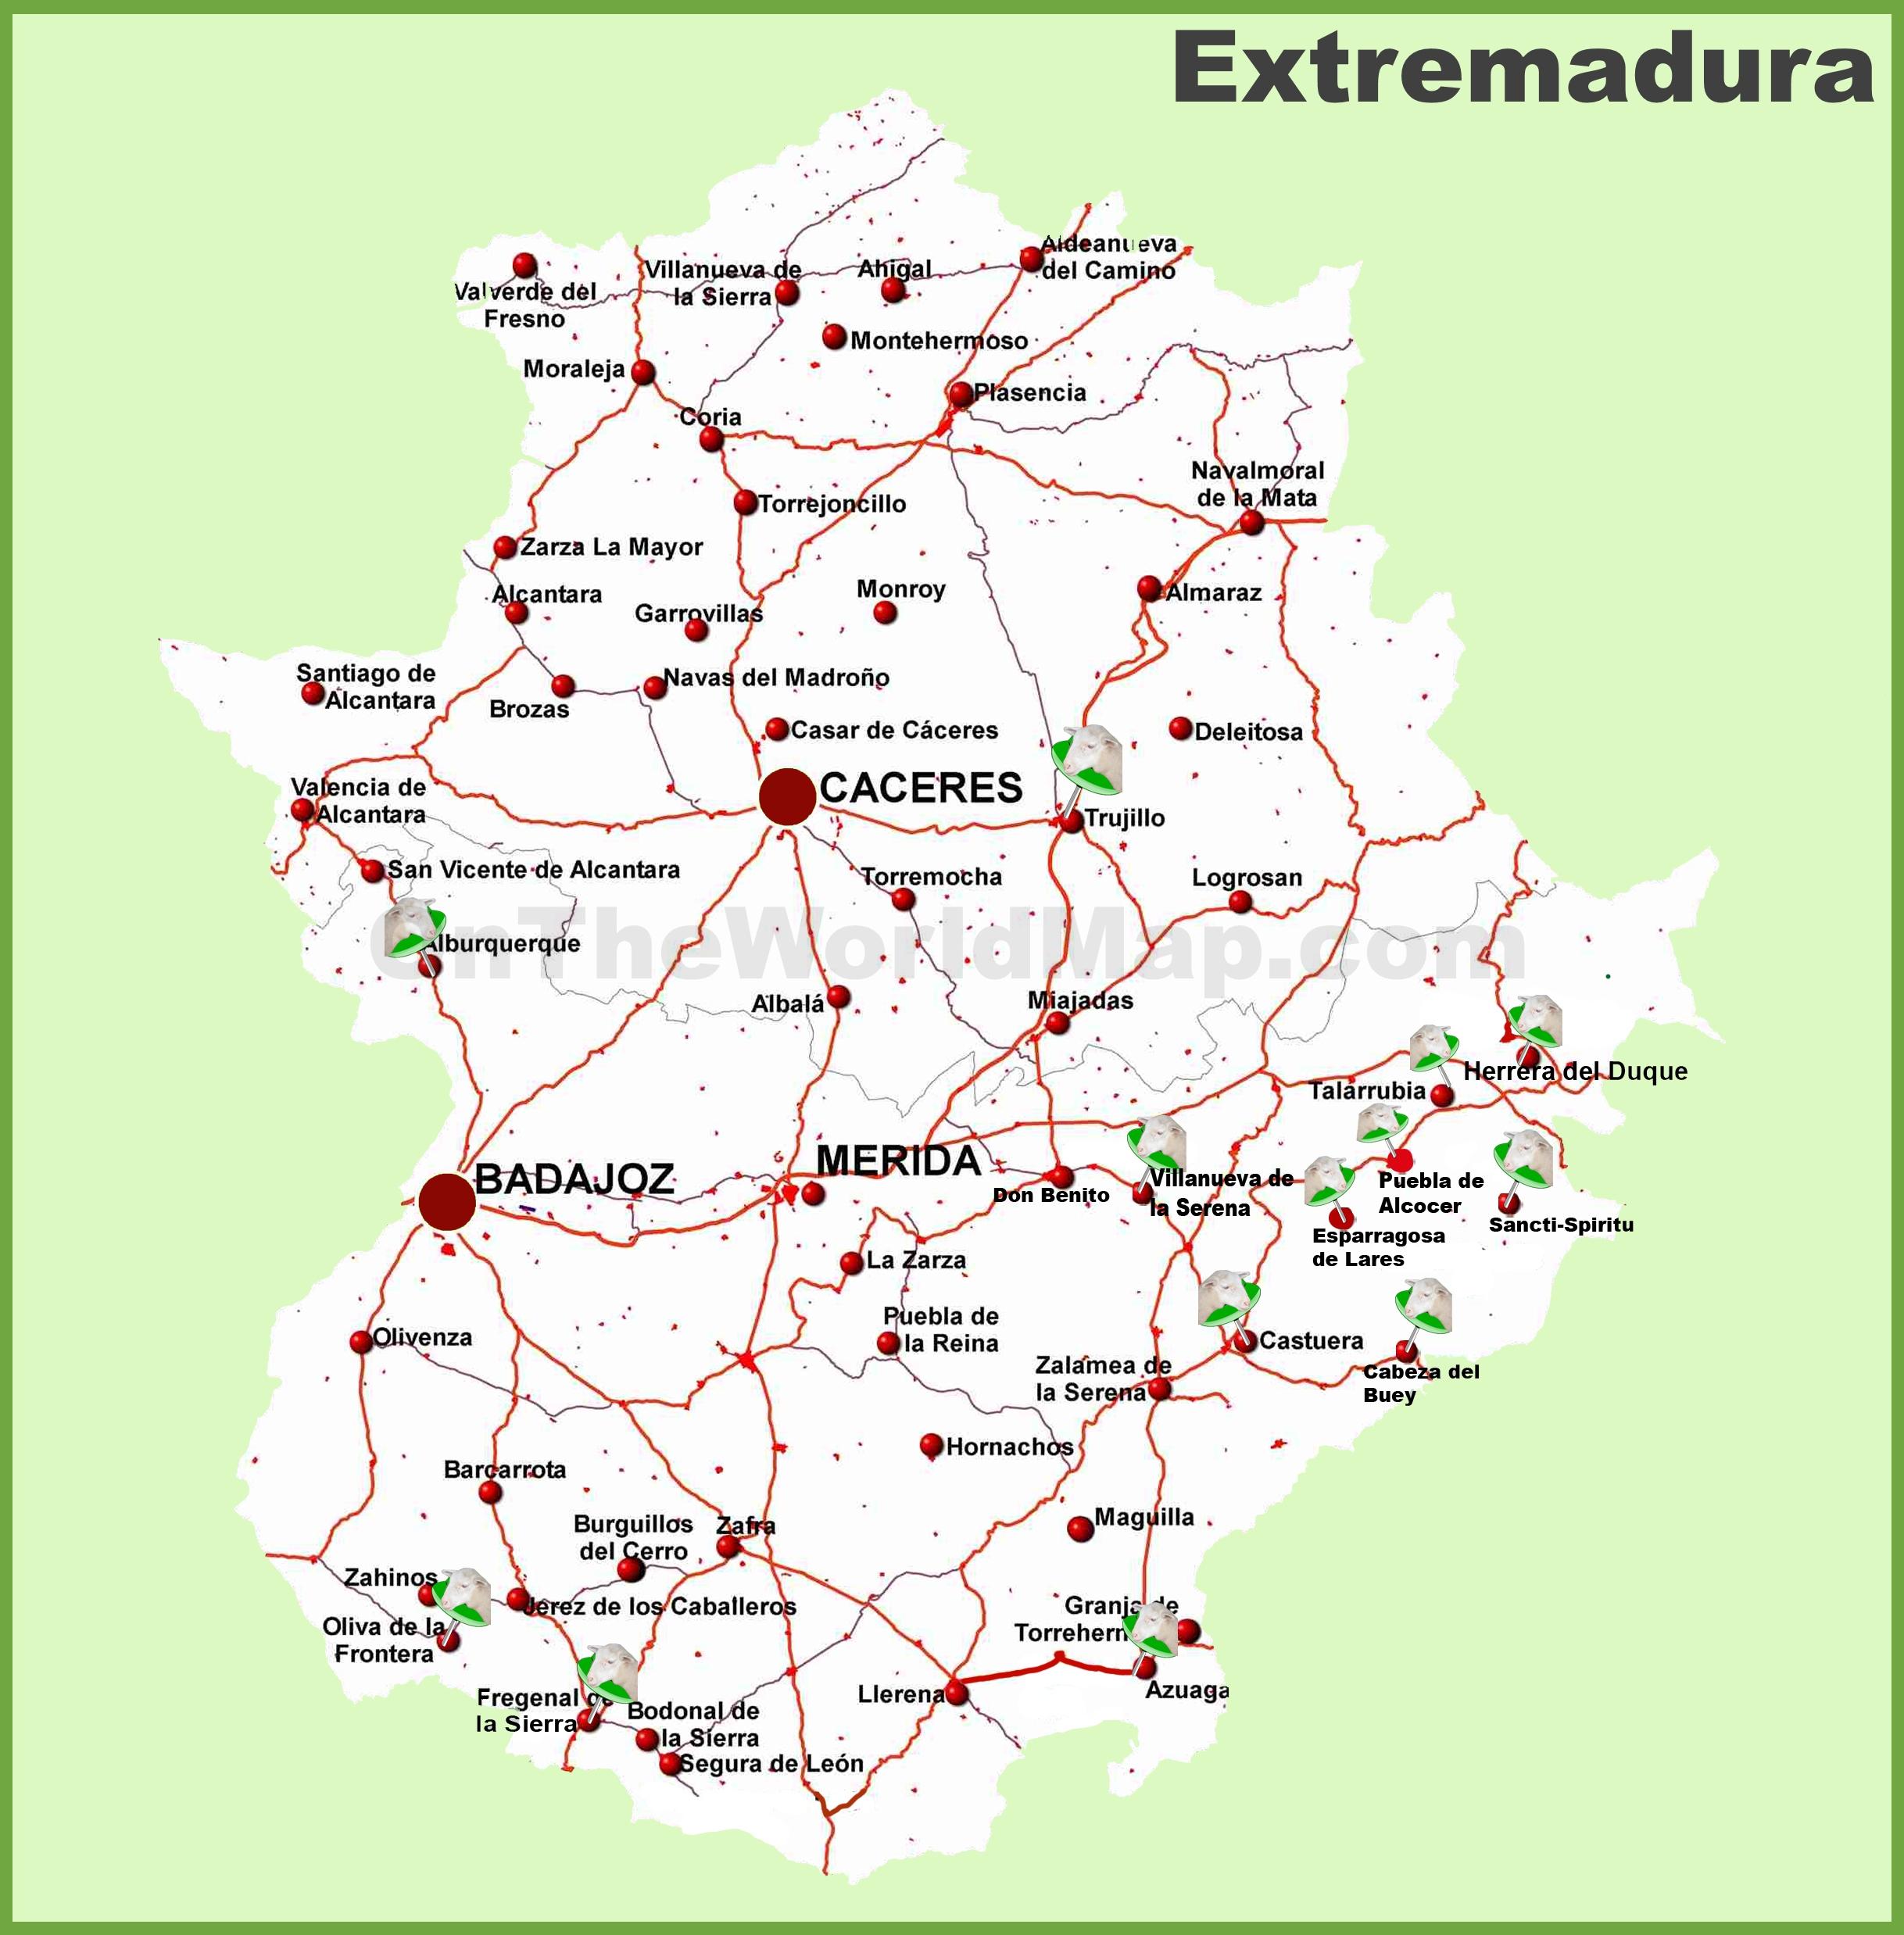 Extremadura road map